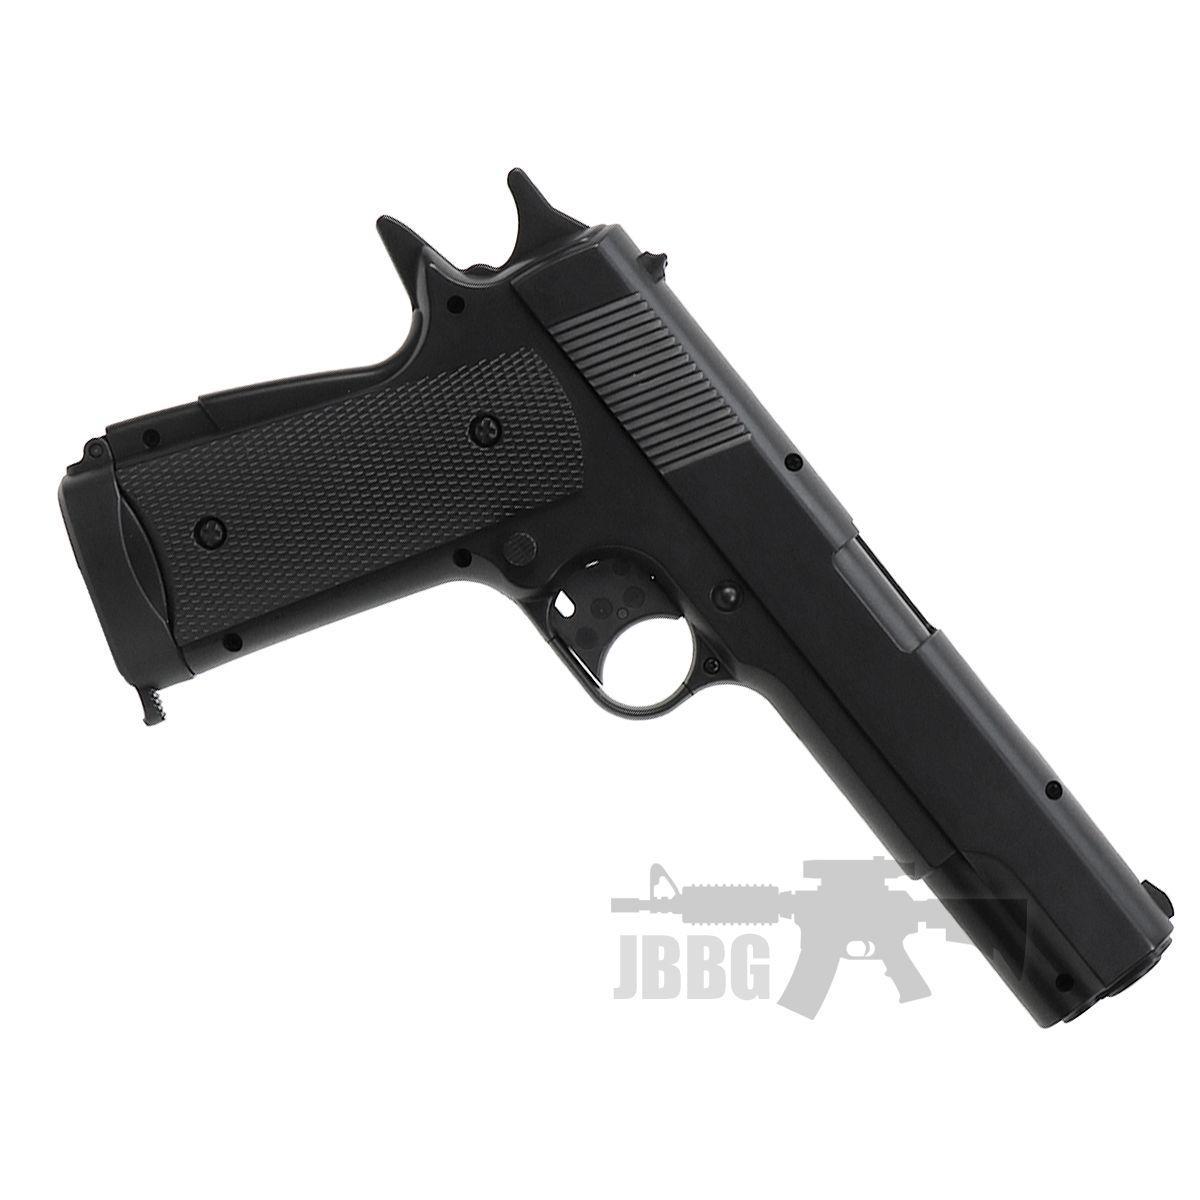 hgc312 airsoft gas pistol jbbg 1